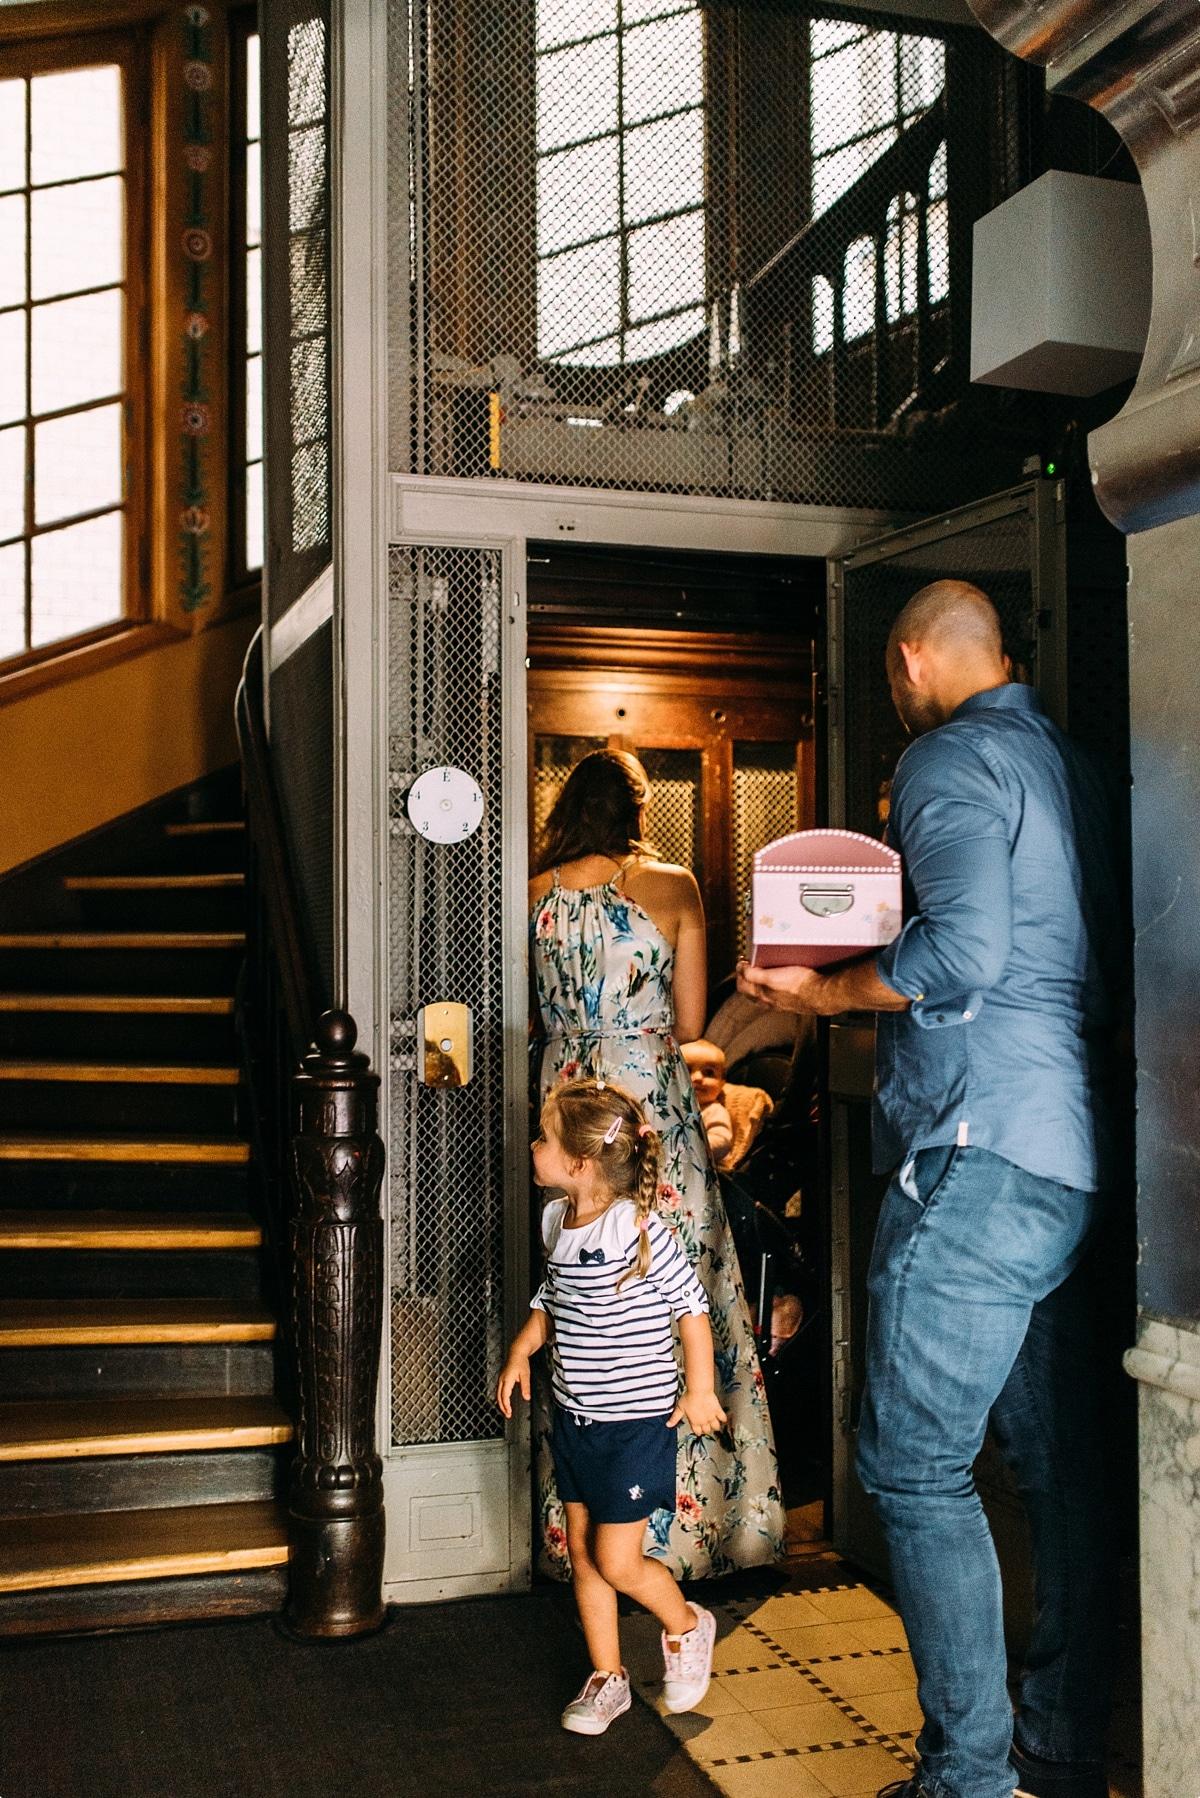 Junge Familie im Treppenhaus steigen aus dem Fahrstuhl